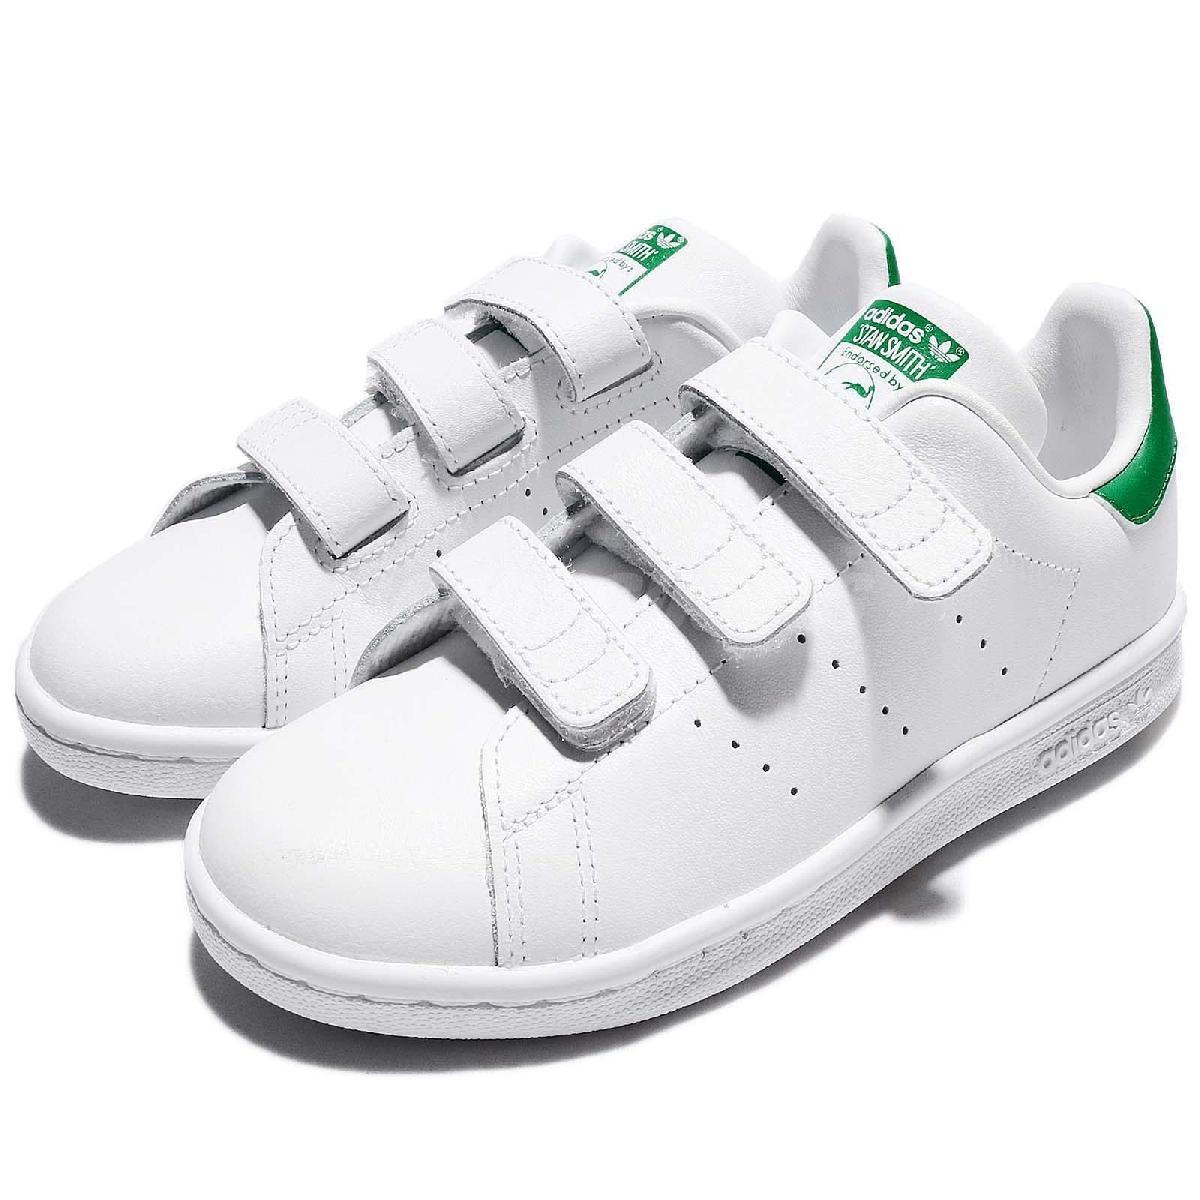 adidas 休閒鞋 Stan Smith CF C 白 綠 基本款 魔鬼氈 童鞋 中童鞋【PUMP306】 M20607